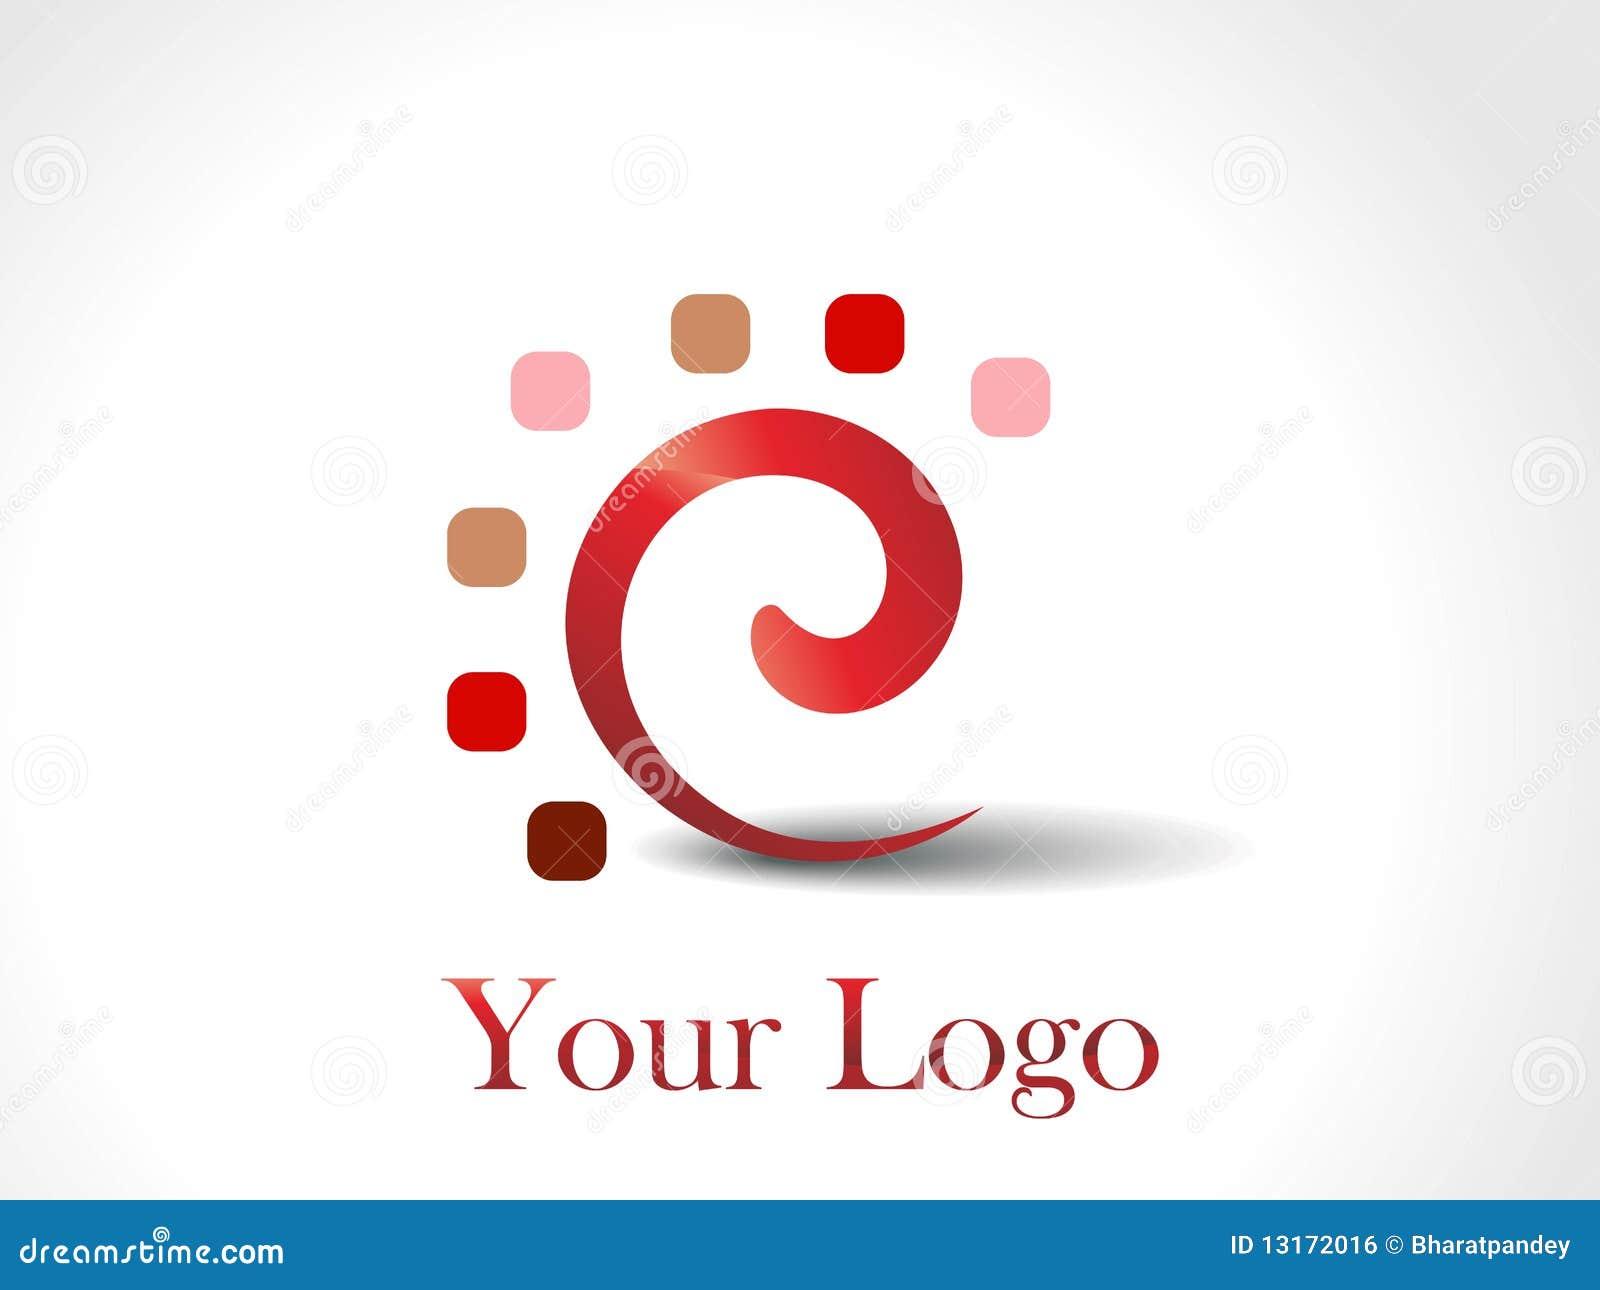 A set of unique logo design royalty free stock image for Design lago